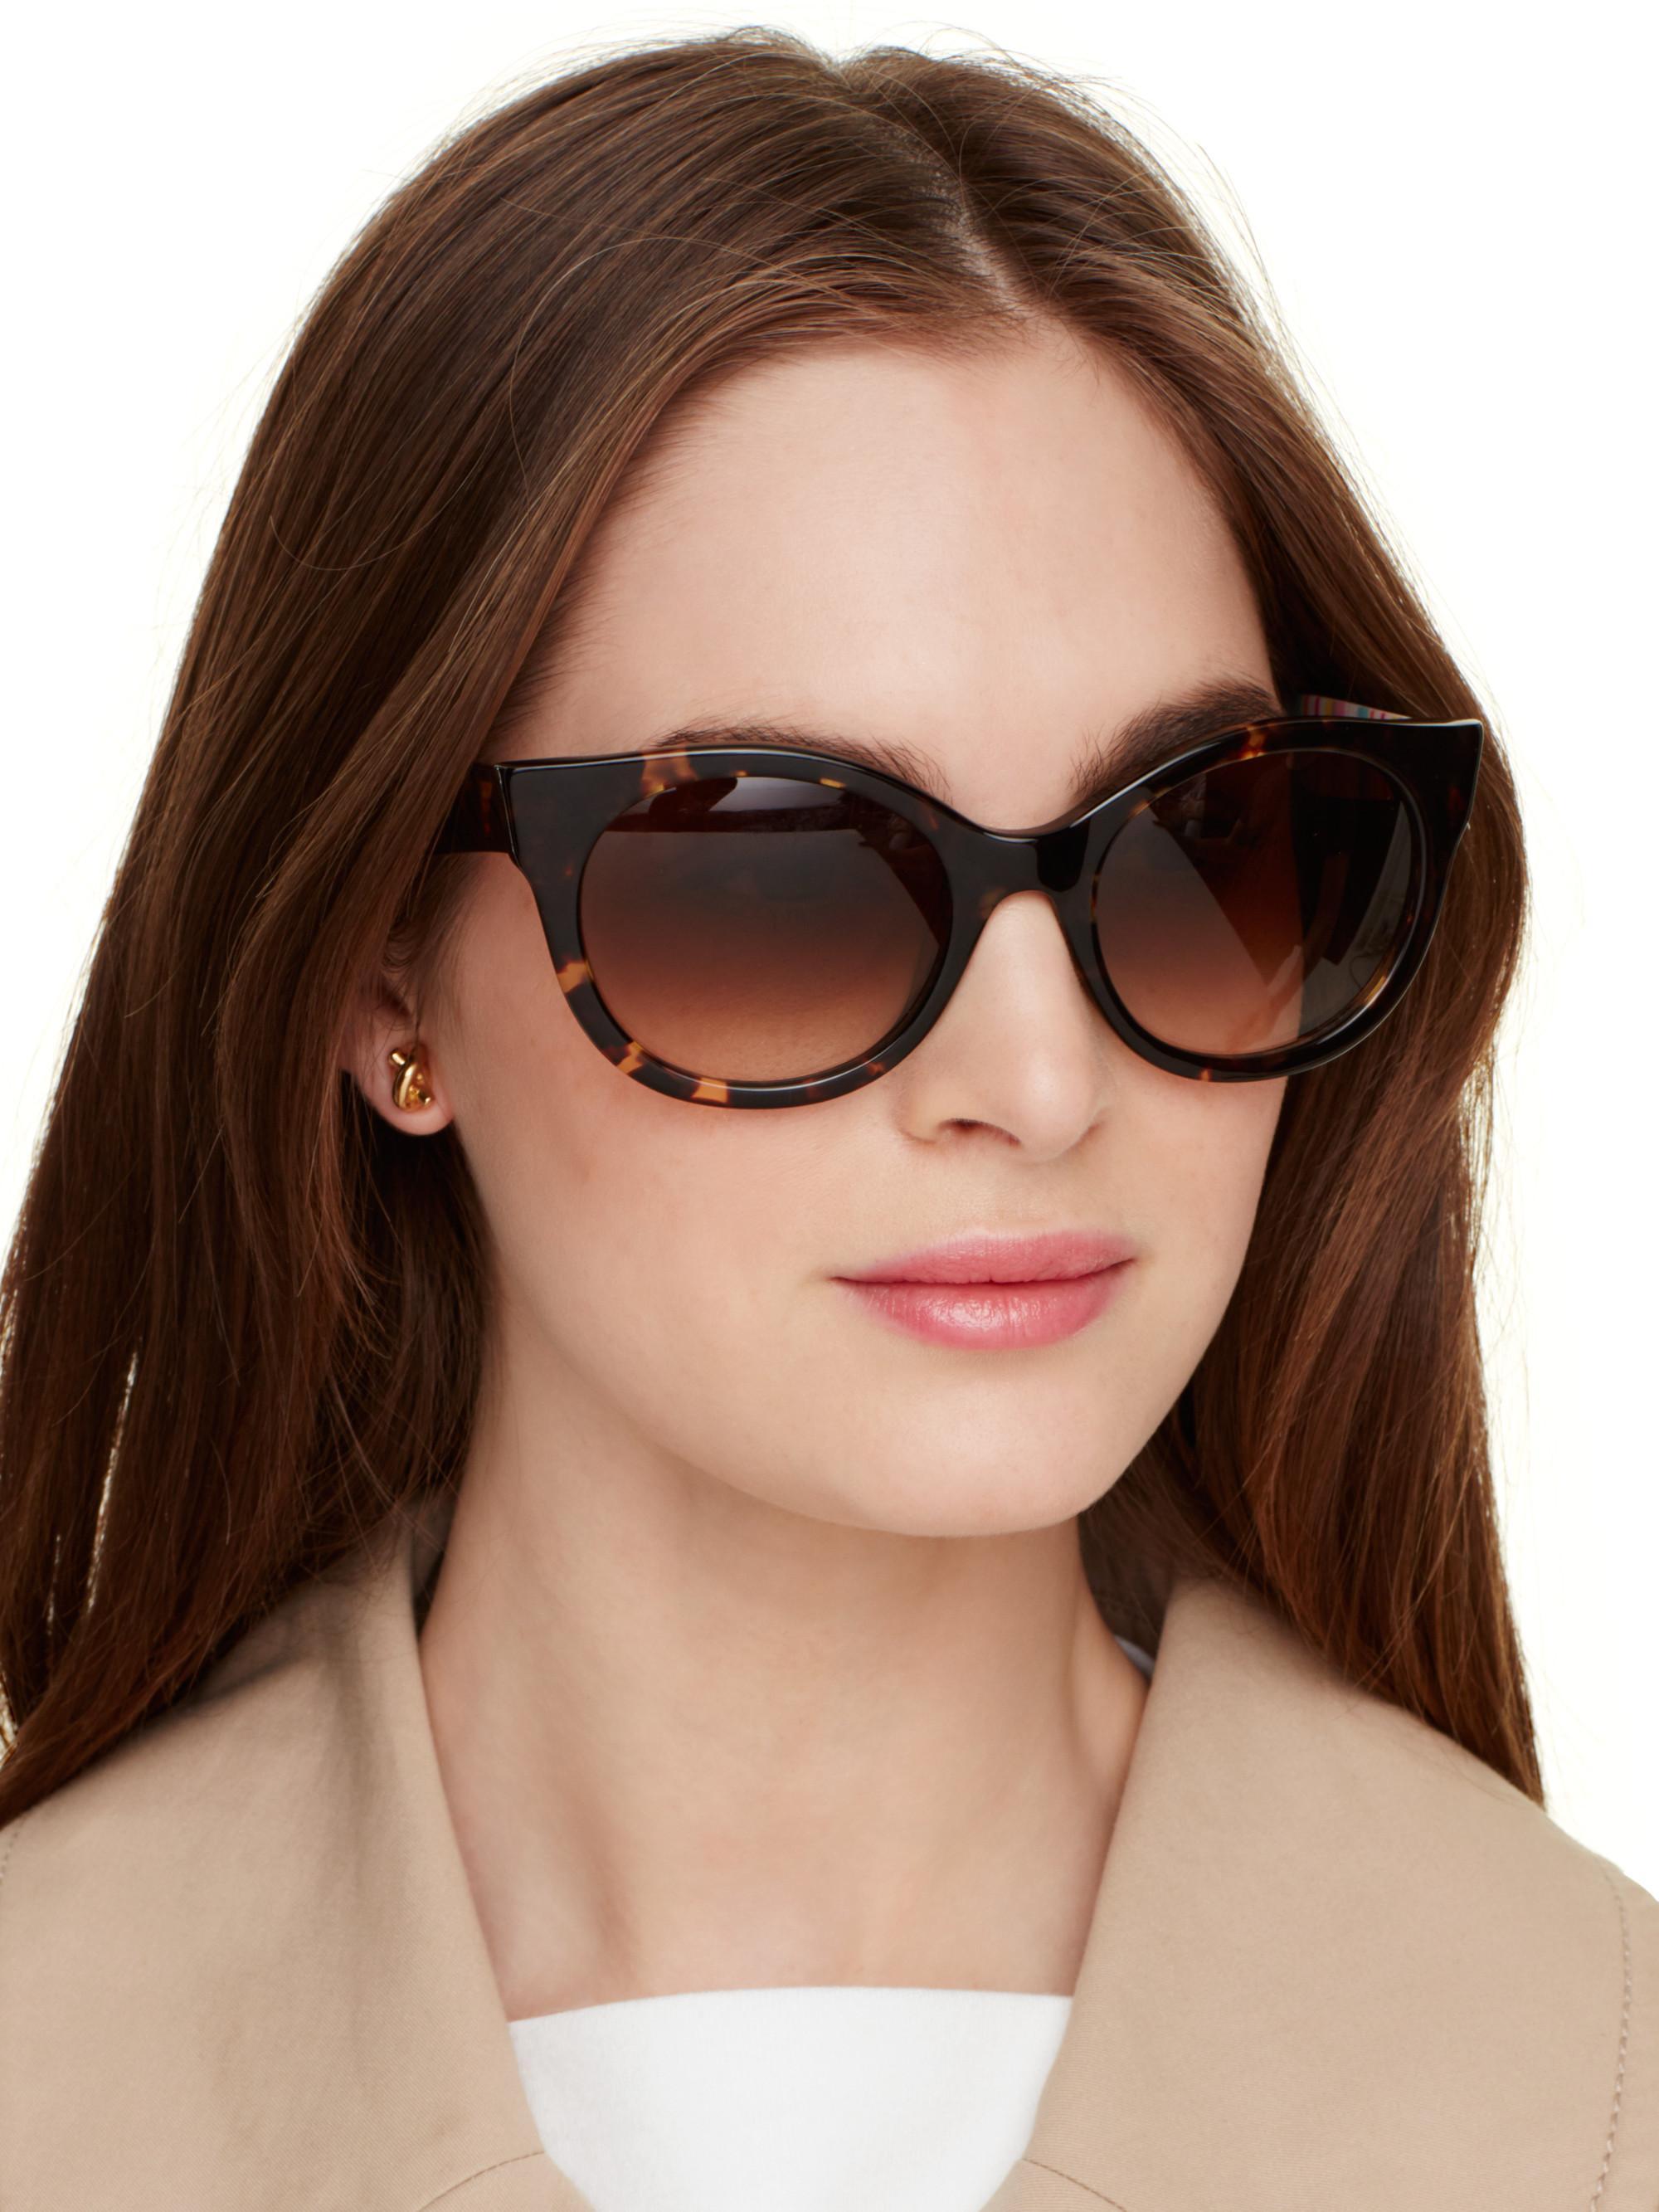 7f1f6240e3 Lyst - Kate Spade Melly Sunglasses in Black